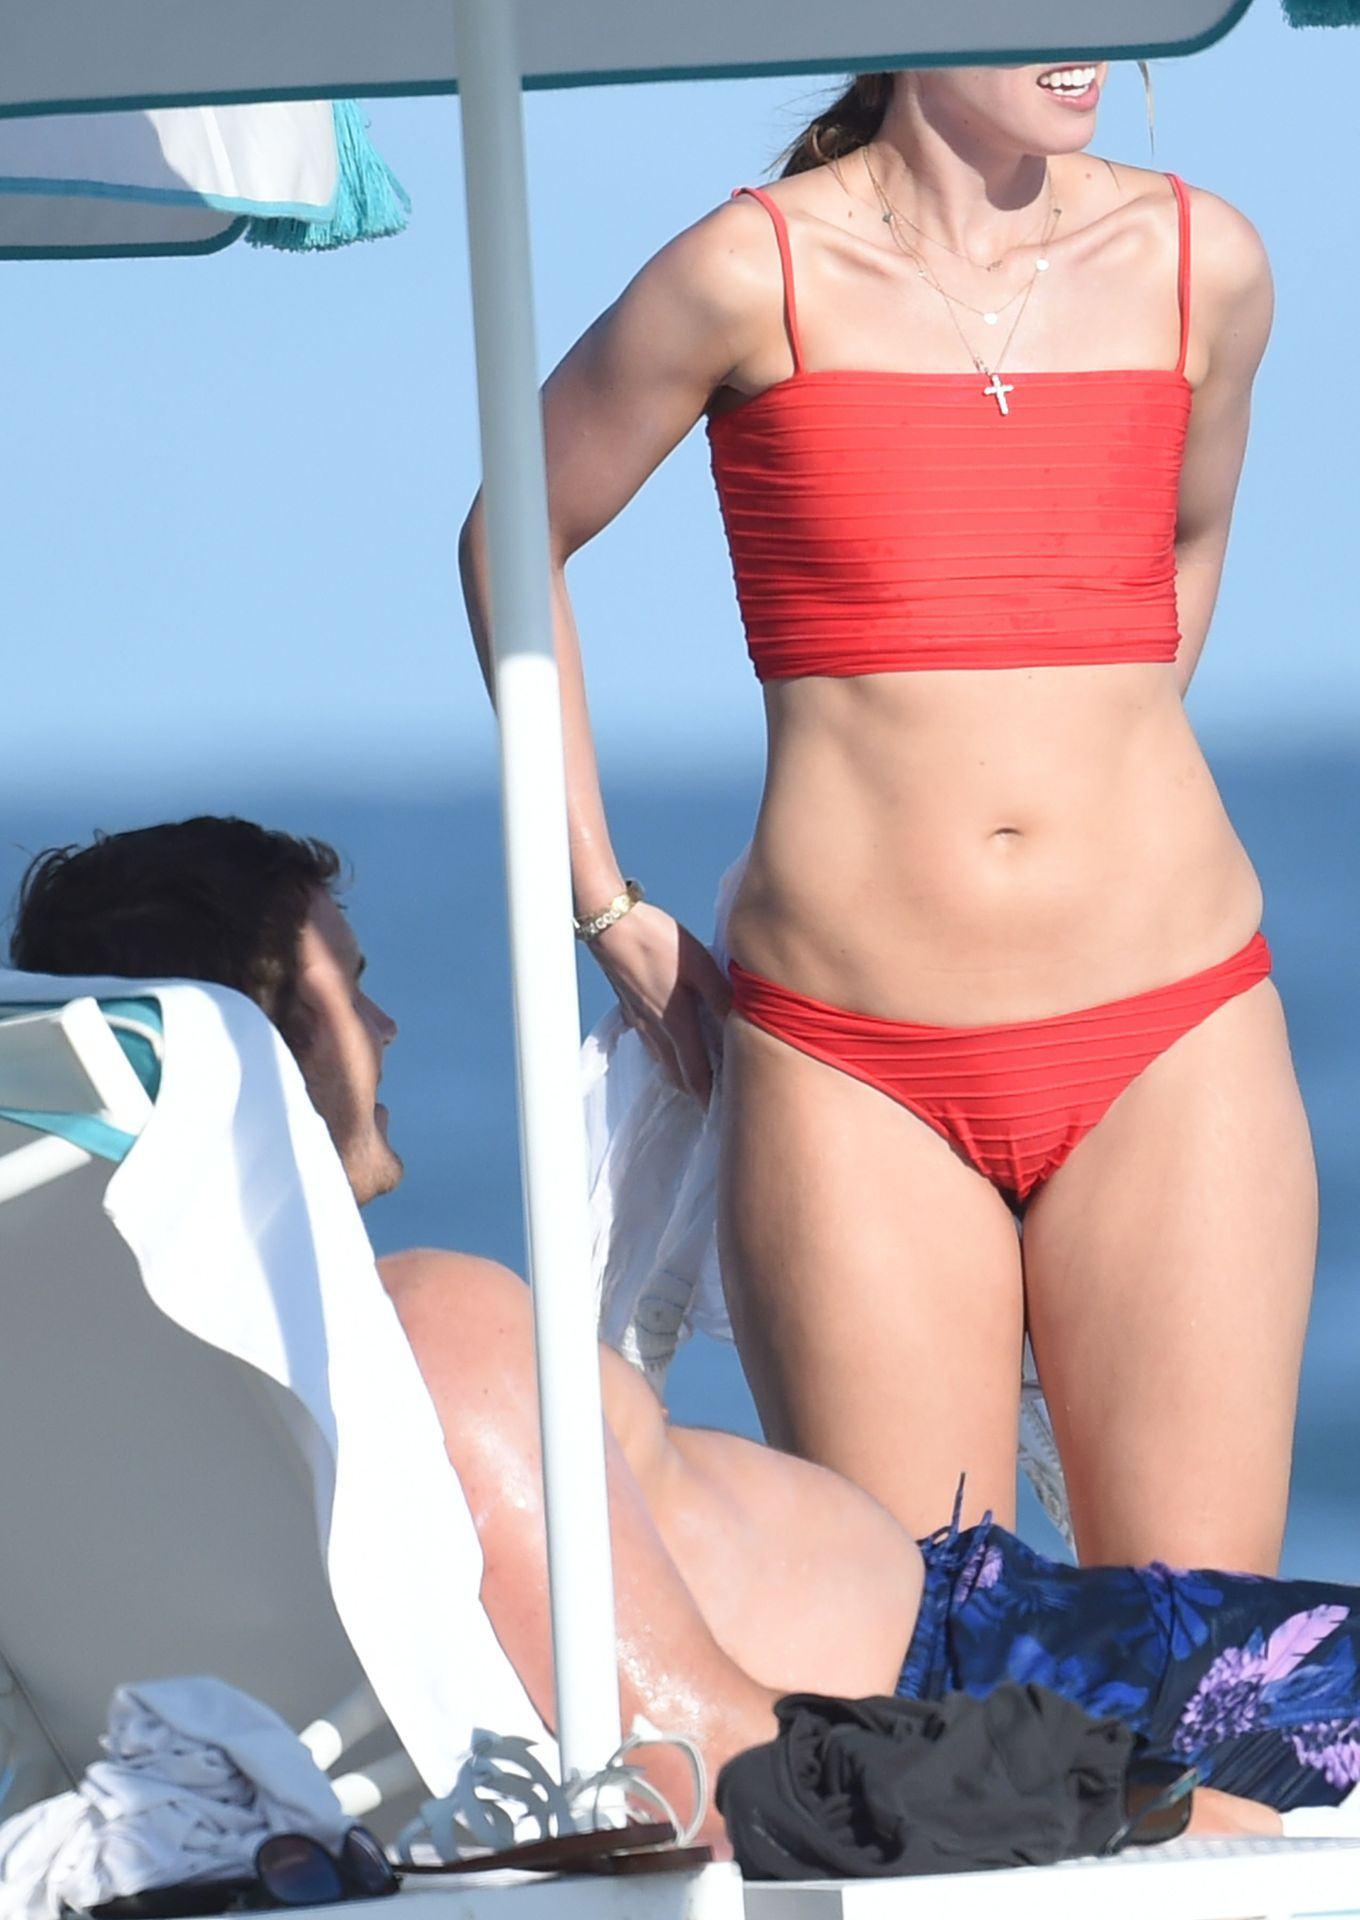 Katherine Schwarzenegger Paparazzi Bikini Beach Photos - Thefappening.link